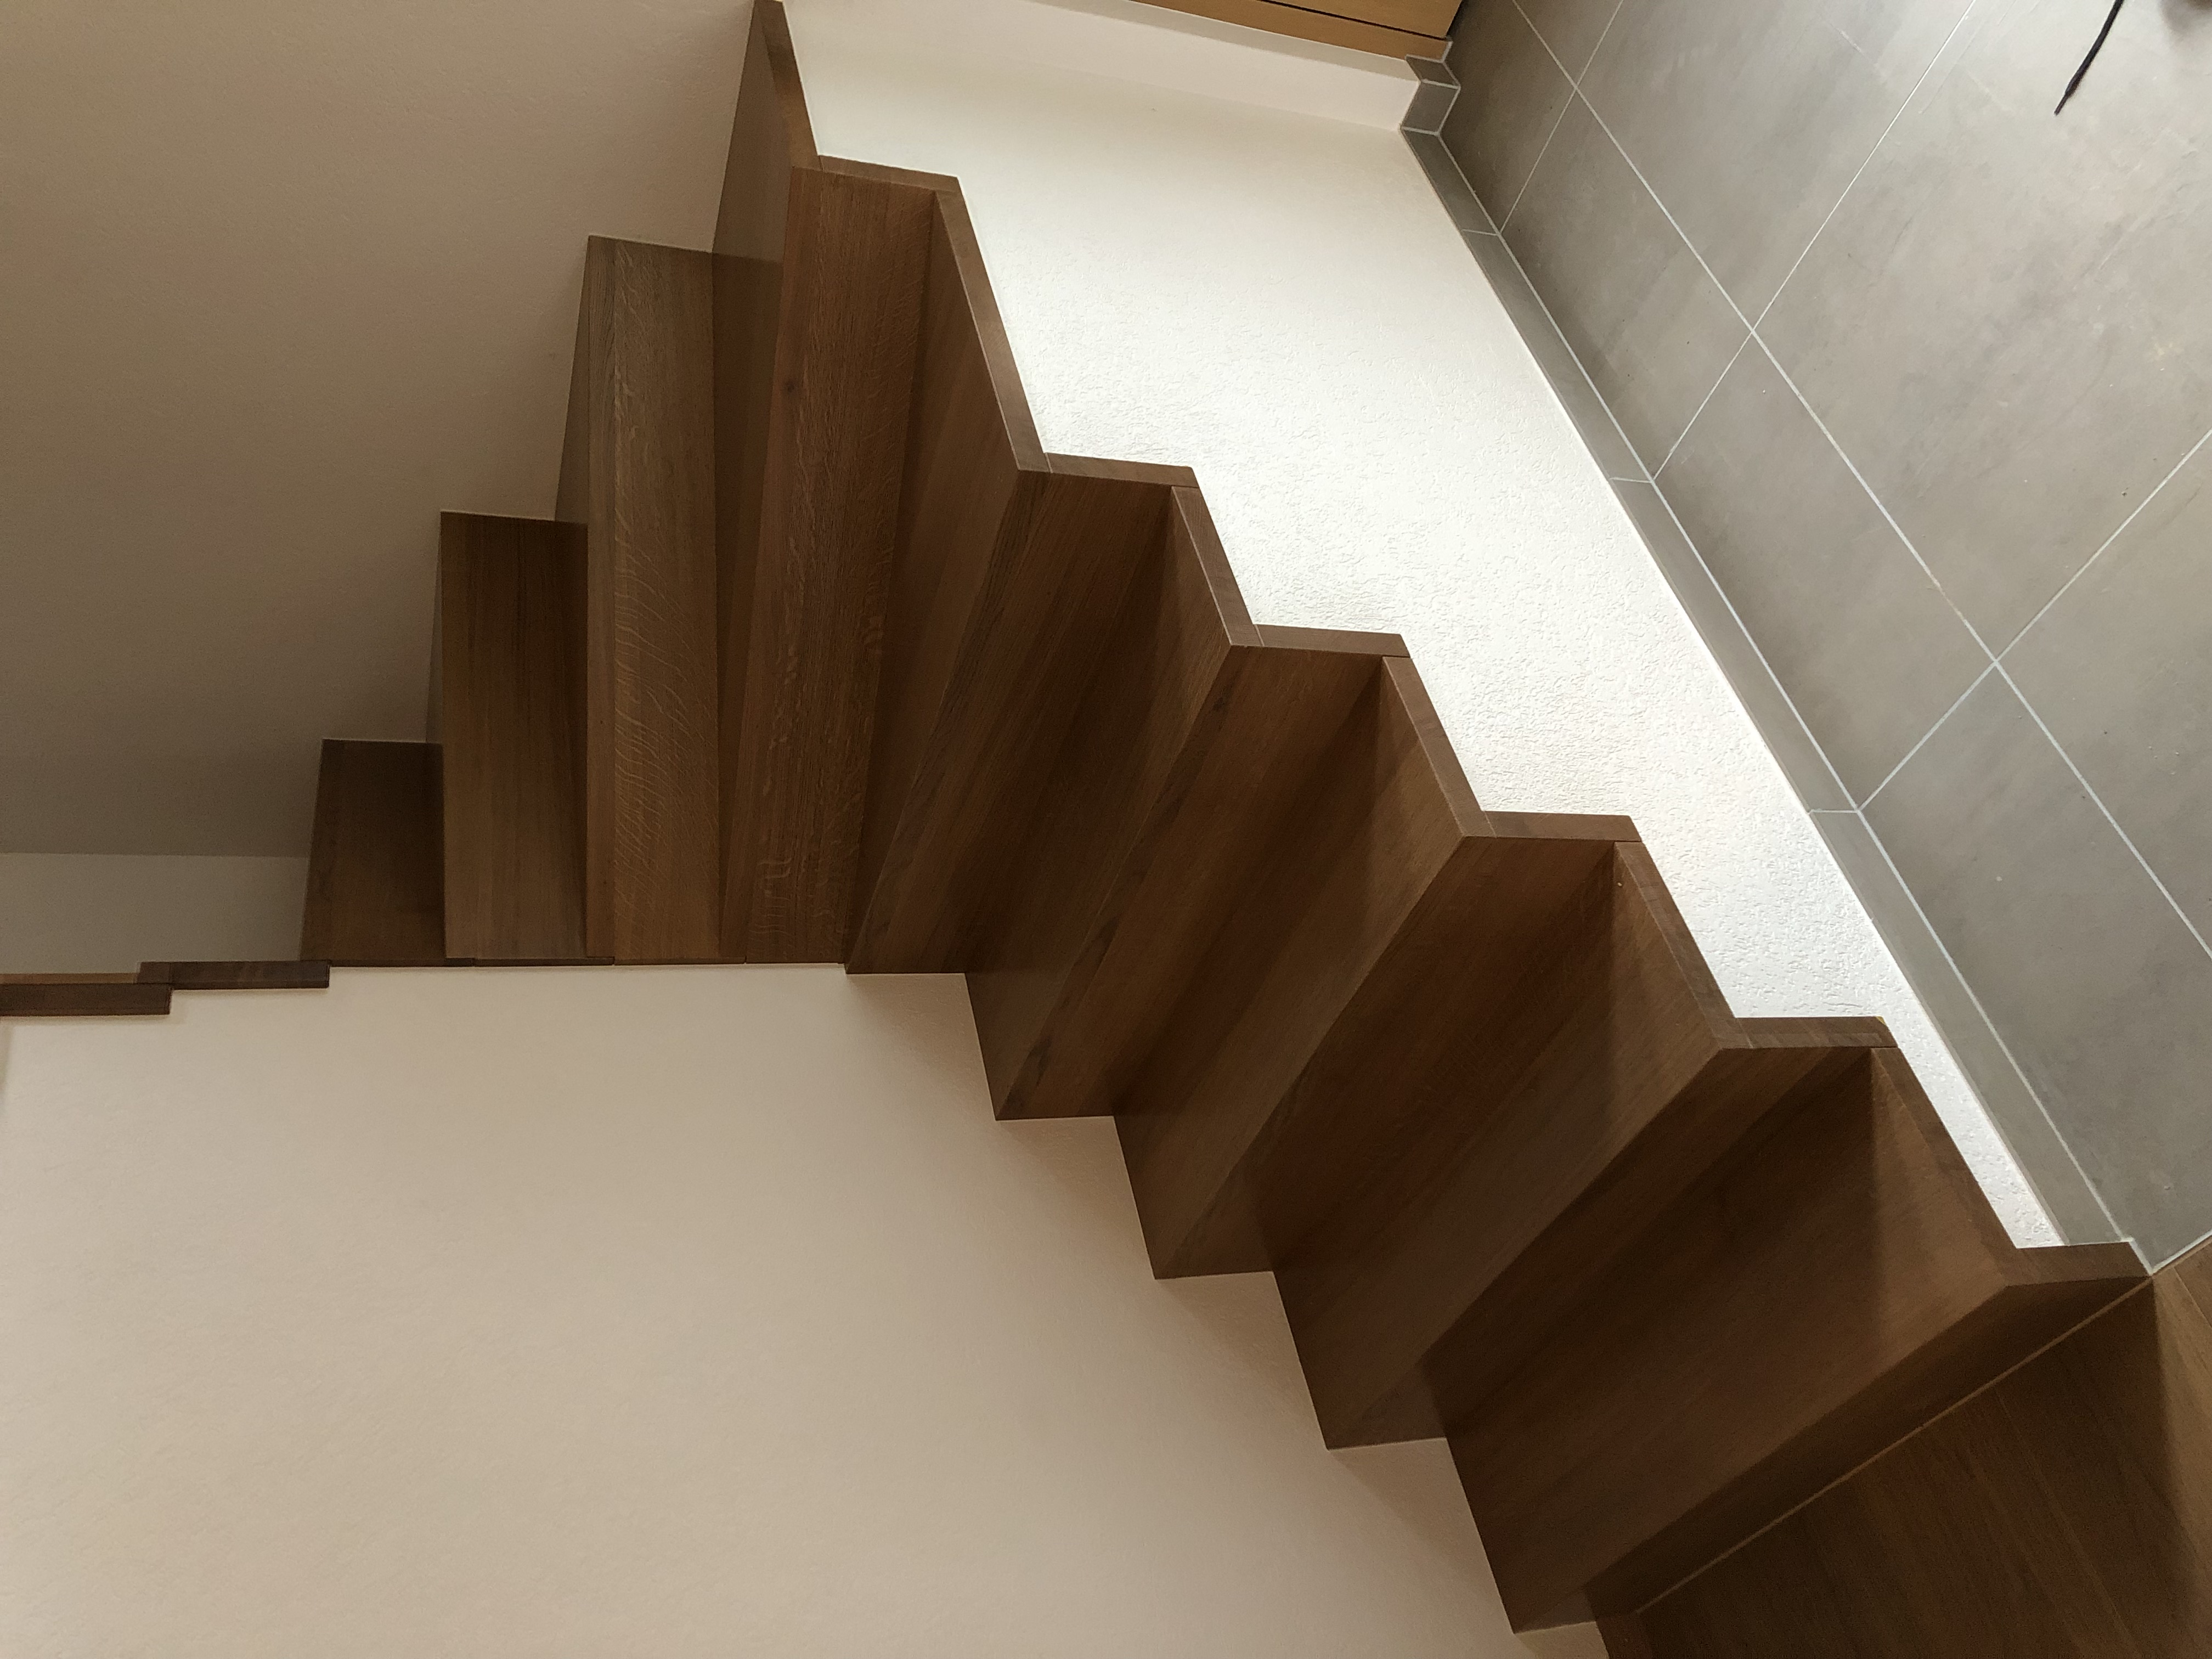 Escalier crémaillère chêne massif